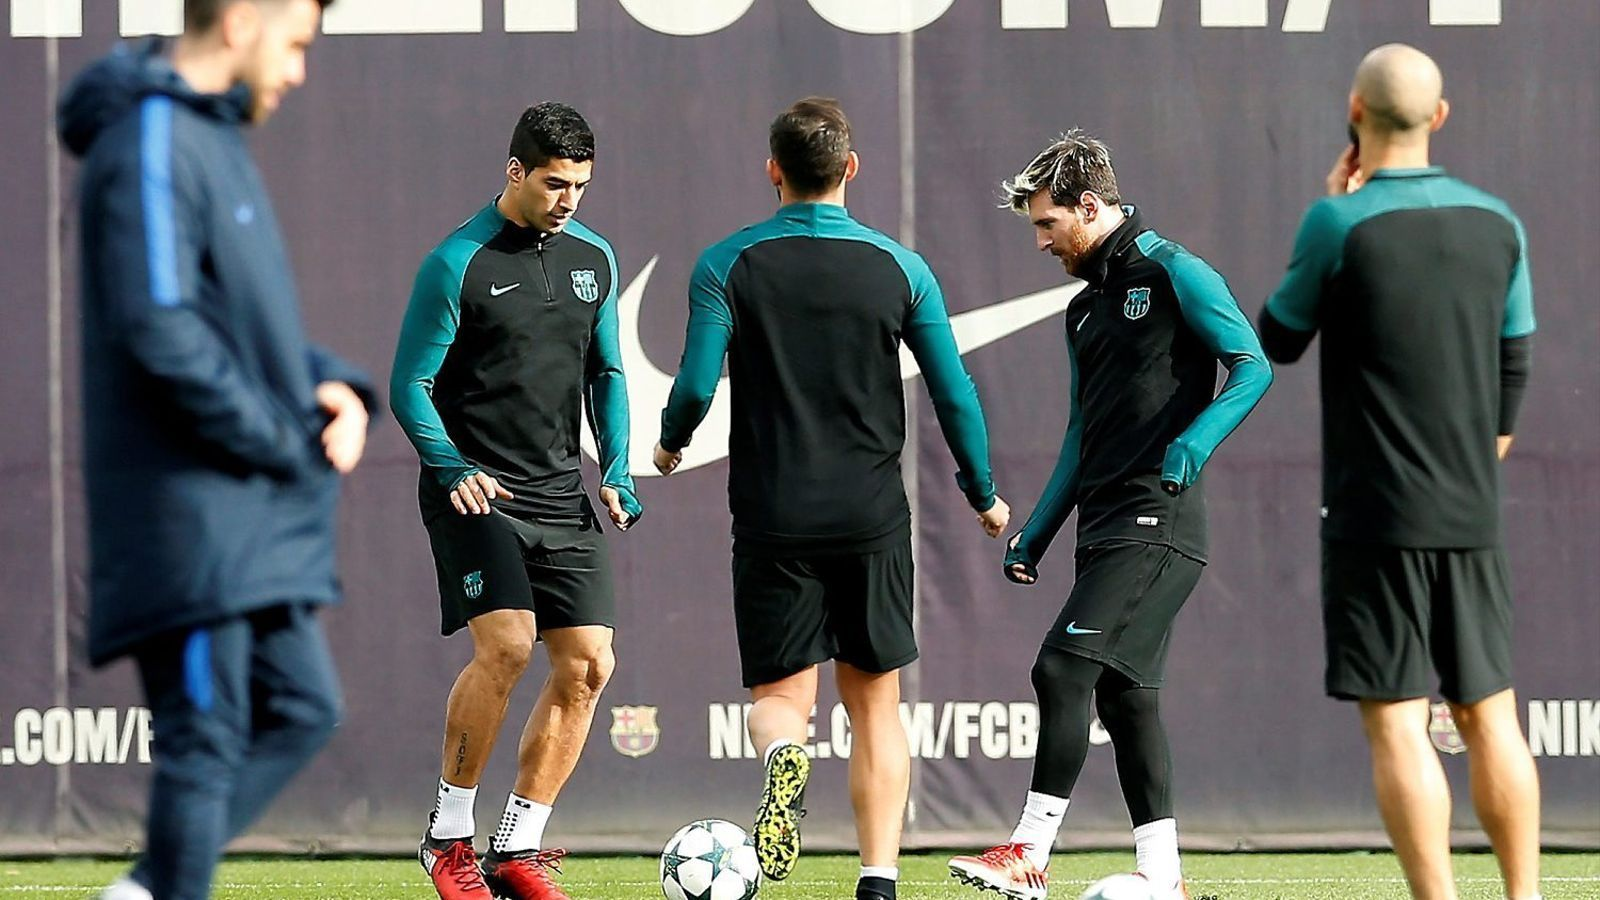 Luis Suárez, Paco Alcácer (d'esquena) i Leo Messi fent-se passades durant l'entrenament d'ahir.